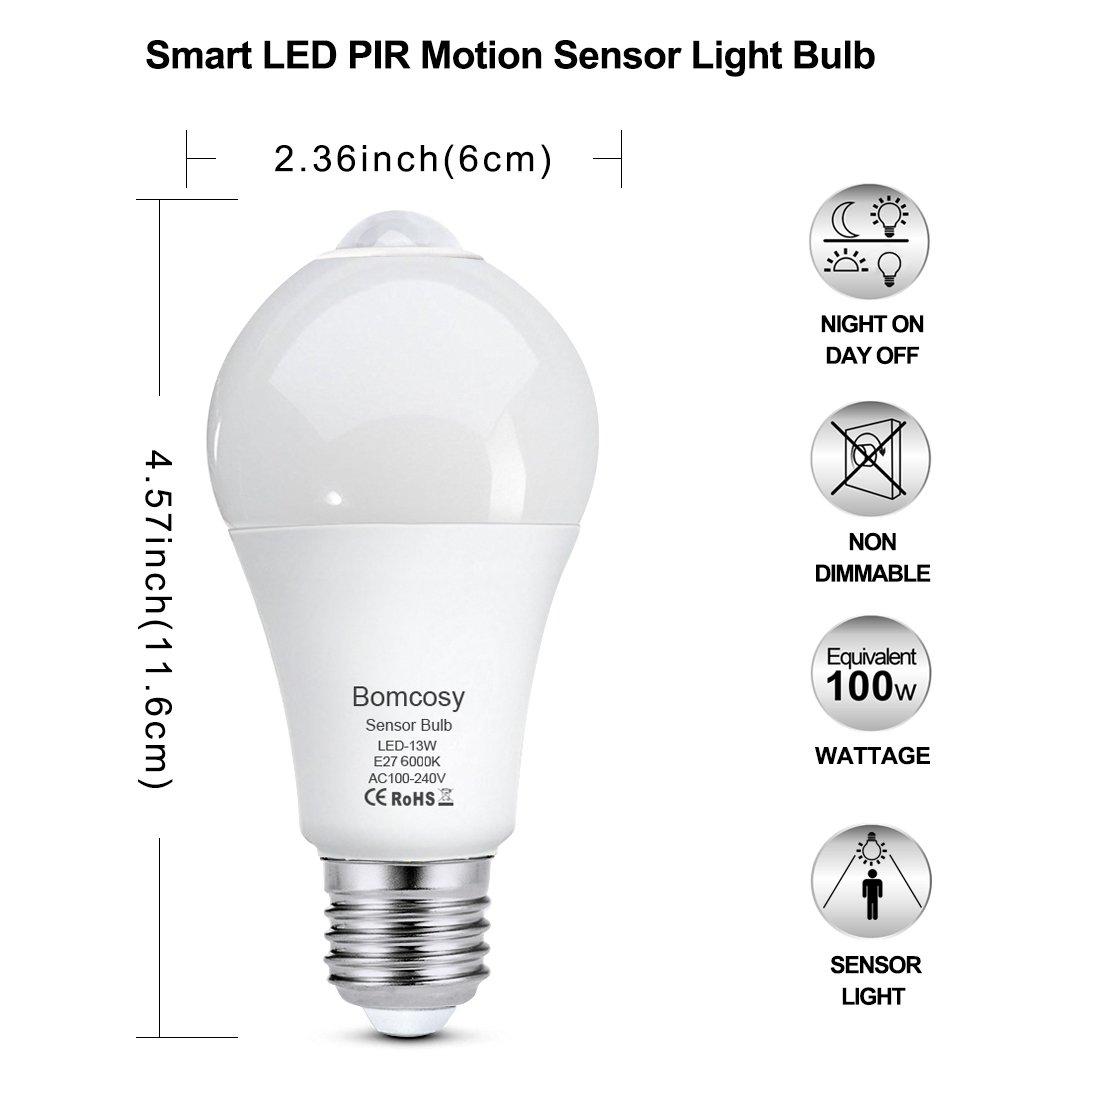 Bomcosy Bombillas LED con Sensor de Movimiento13W E27 Auto On//Off PIR Infrarrojo Detecci/ónBlanco C/álido 3000K Pack de 2